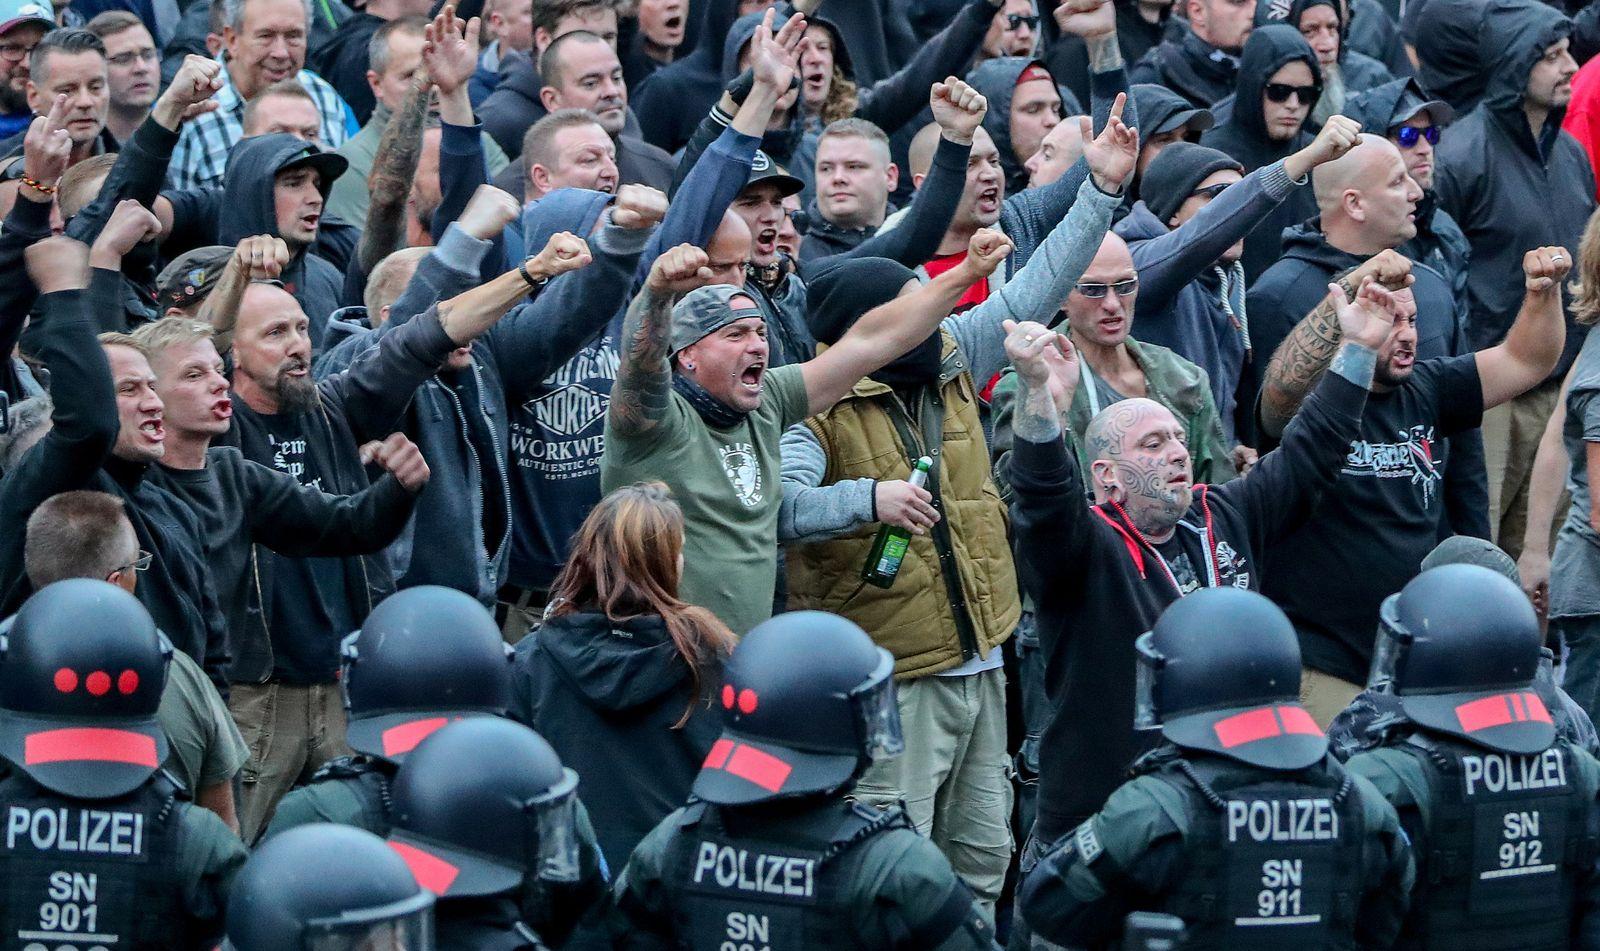 Chemnitz - Demonstranten aus der rechten Szene